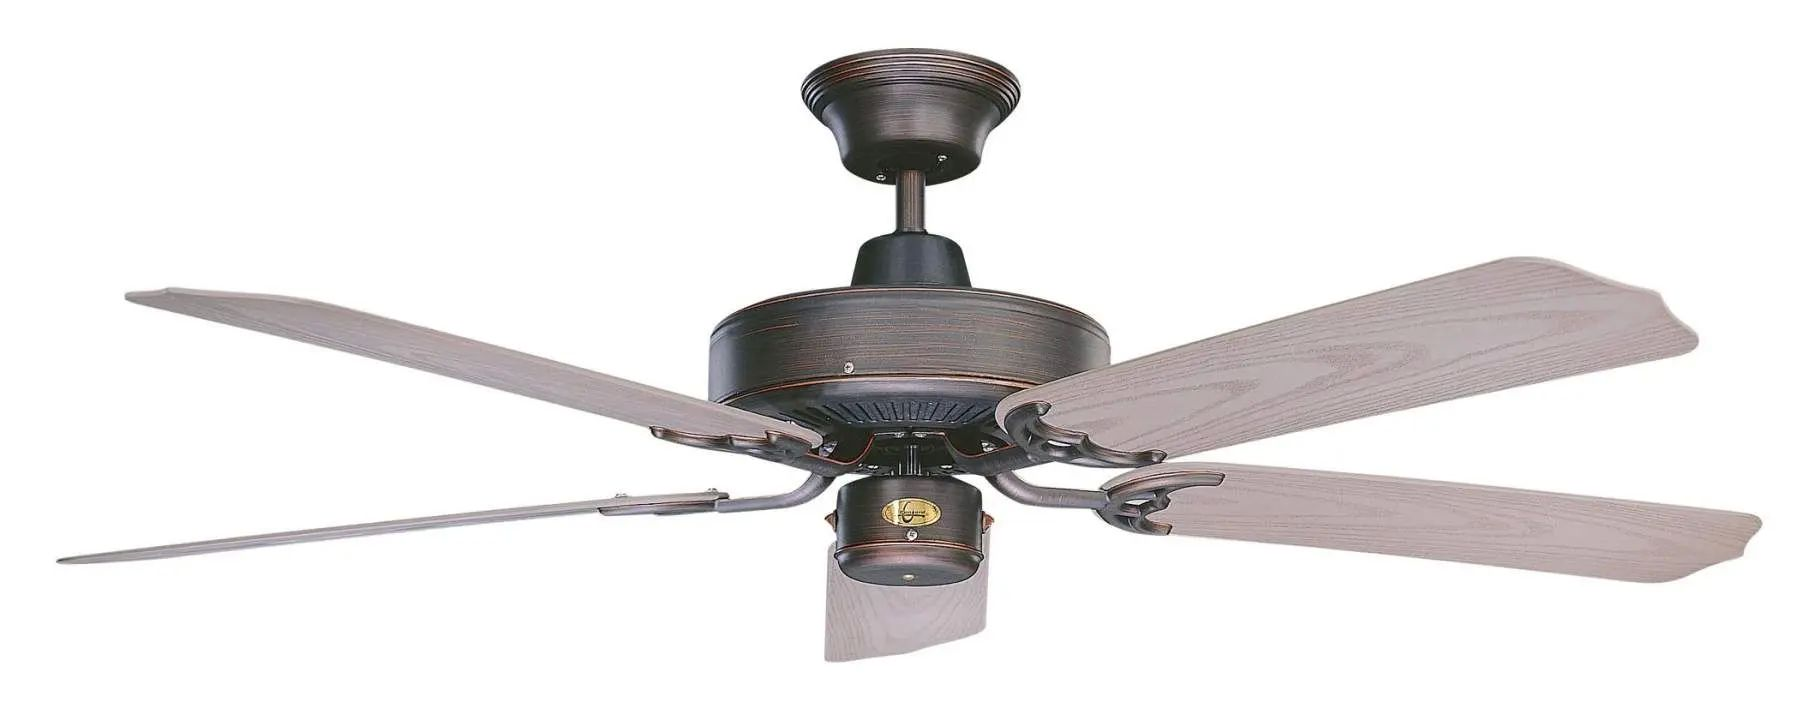 Concord Nautika 52 Outdoor Ceiling Fan in Oil Rubbed Bronze